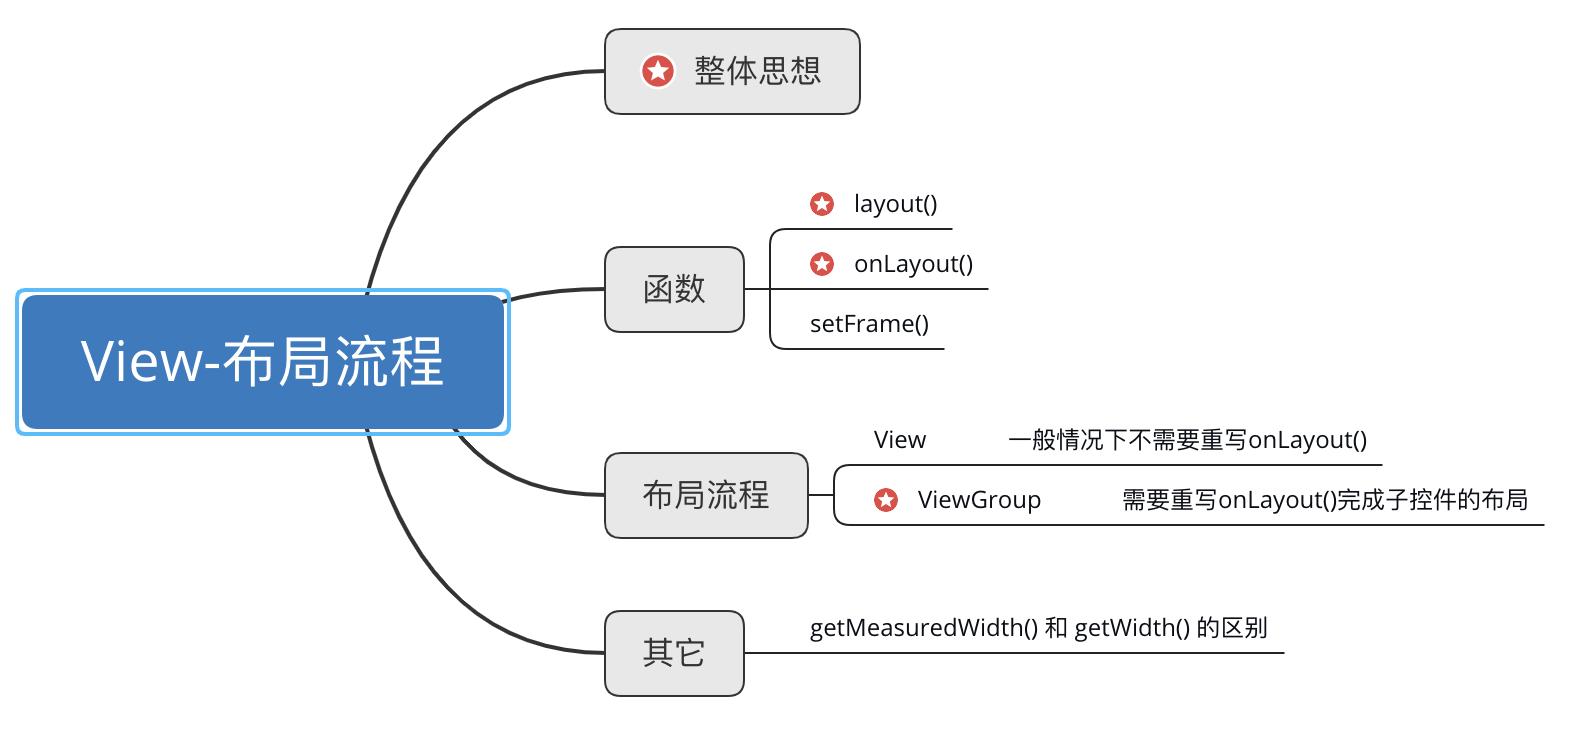 反思 Android View机制设计与实现:布局流程